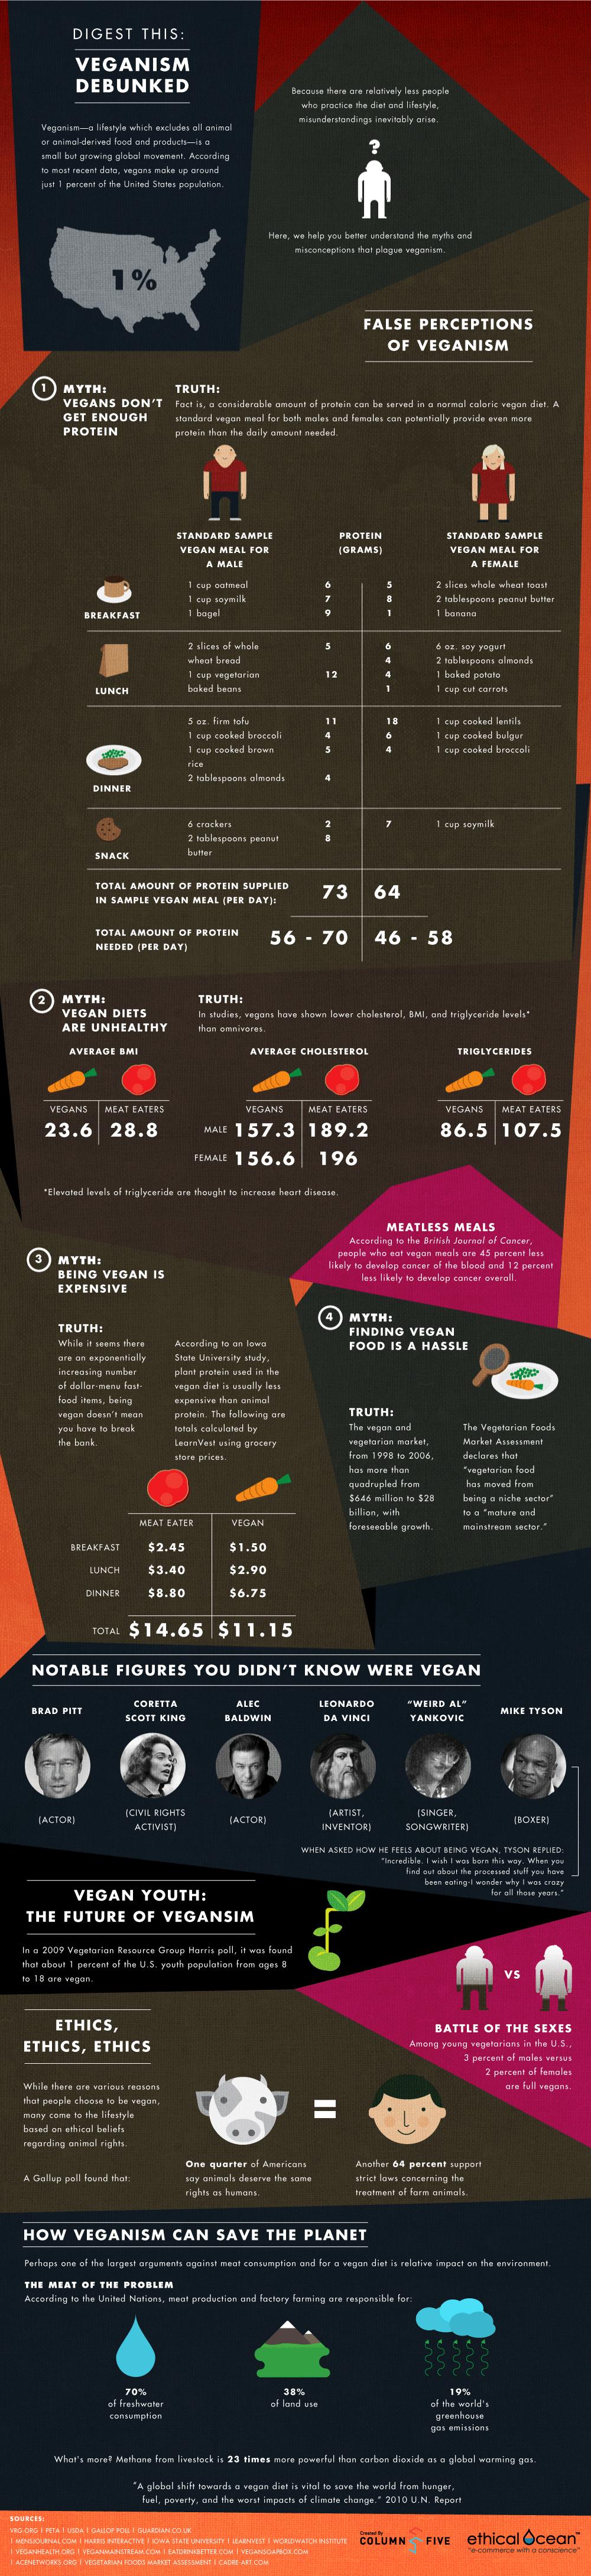 11.09.01-veganism-debunked-infographic-01